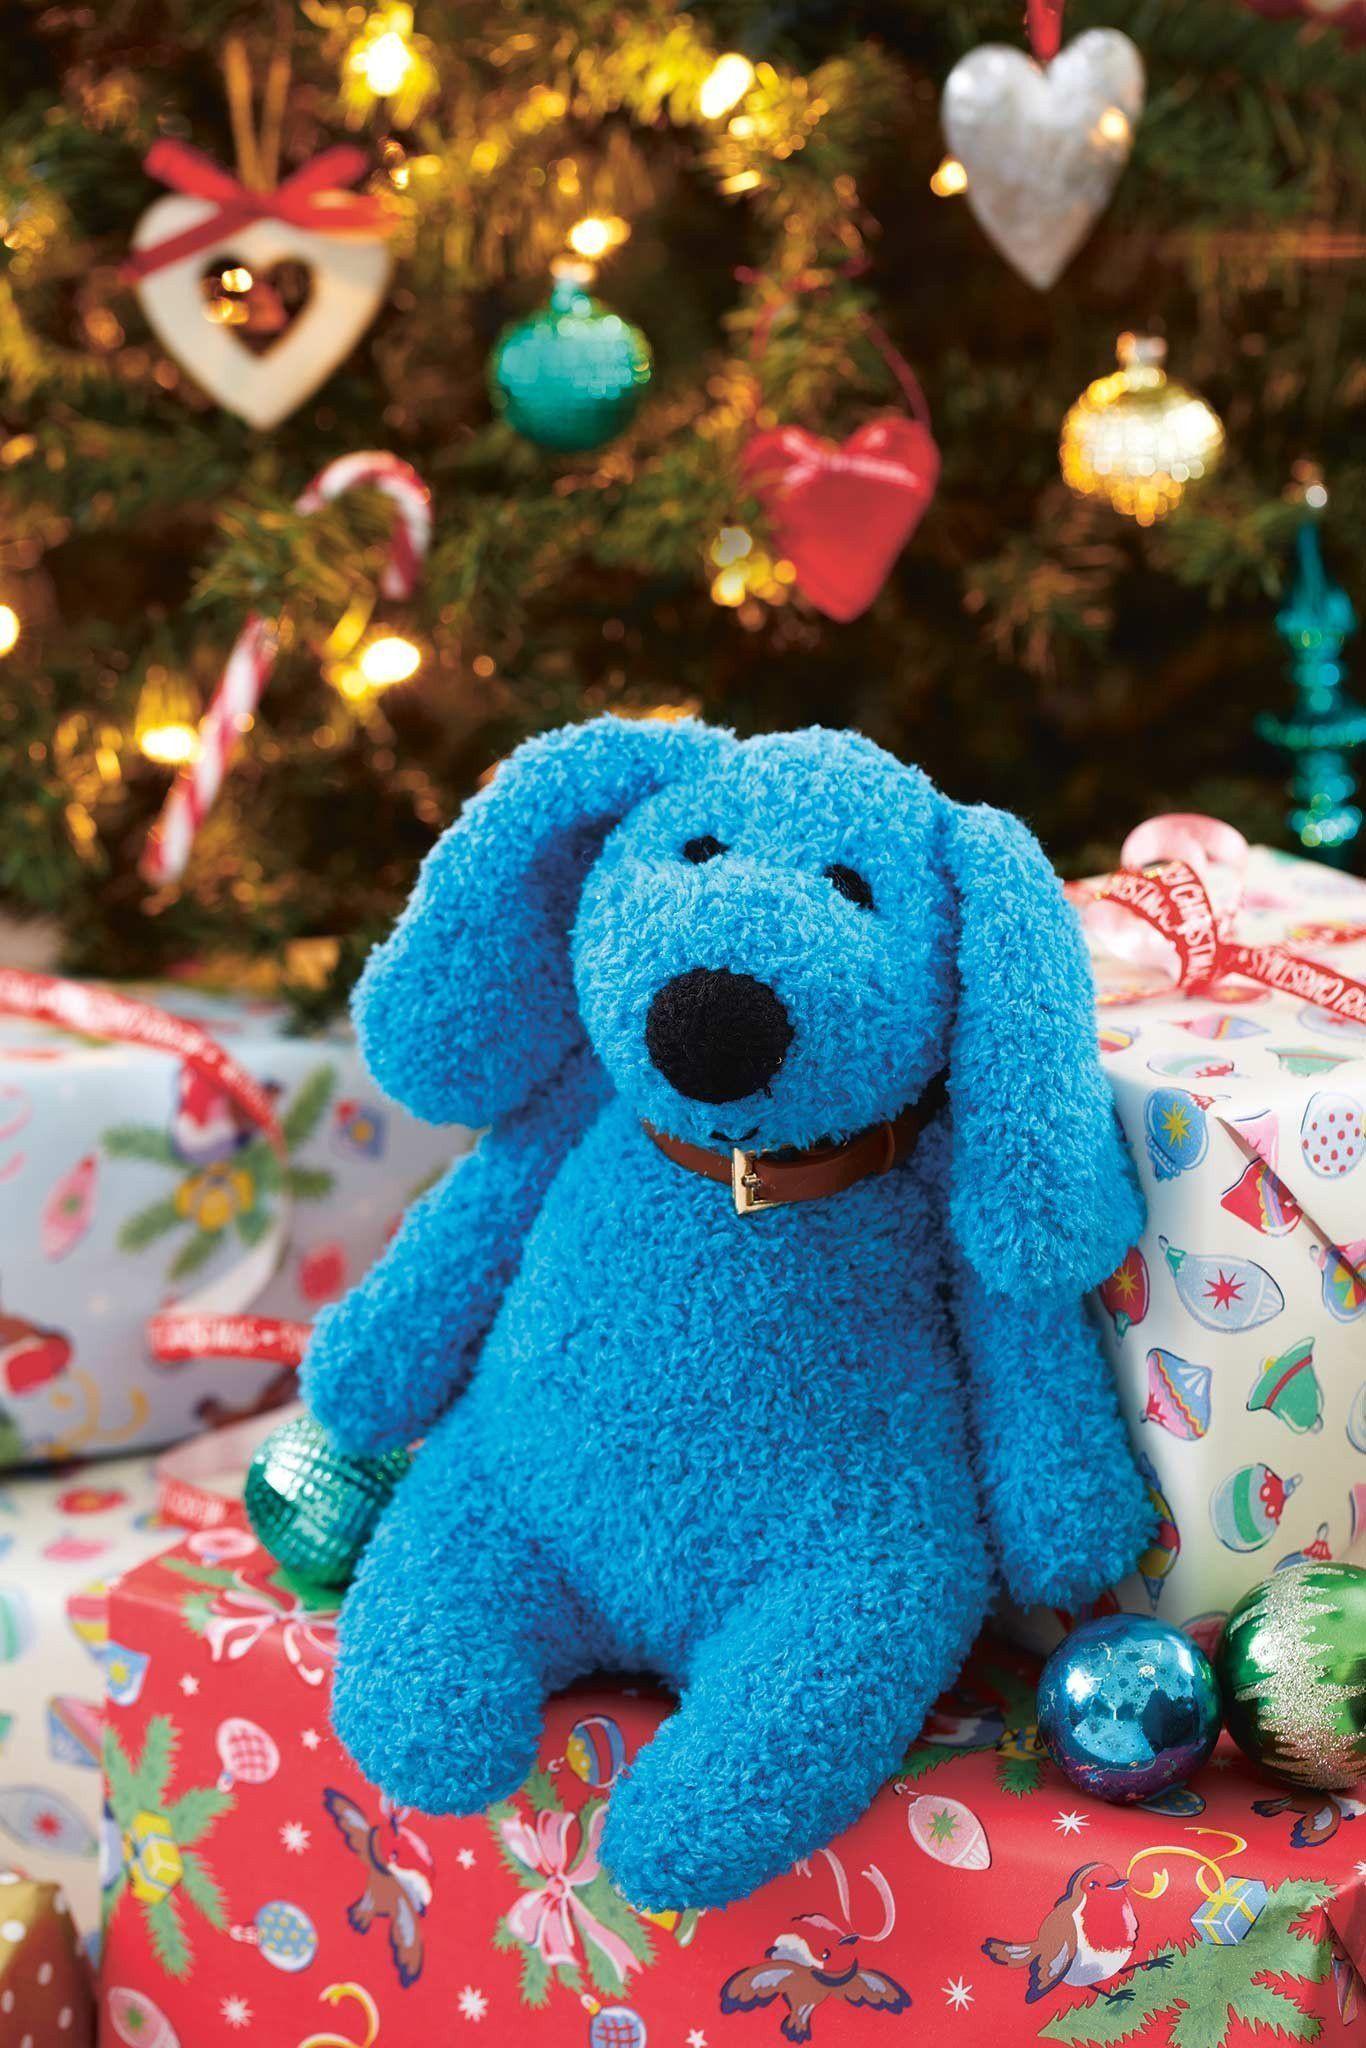 Dog Toy Knitting Pattern   The Knitting Network